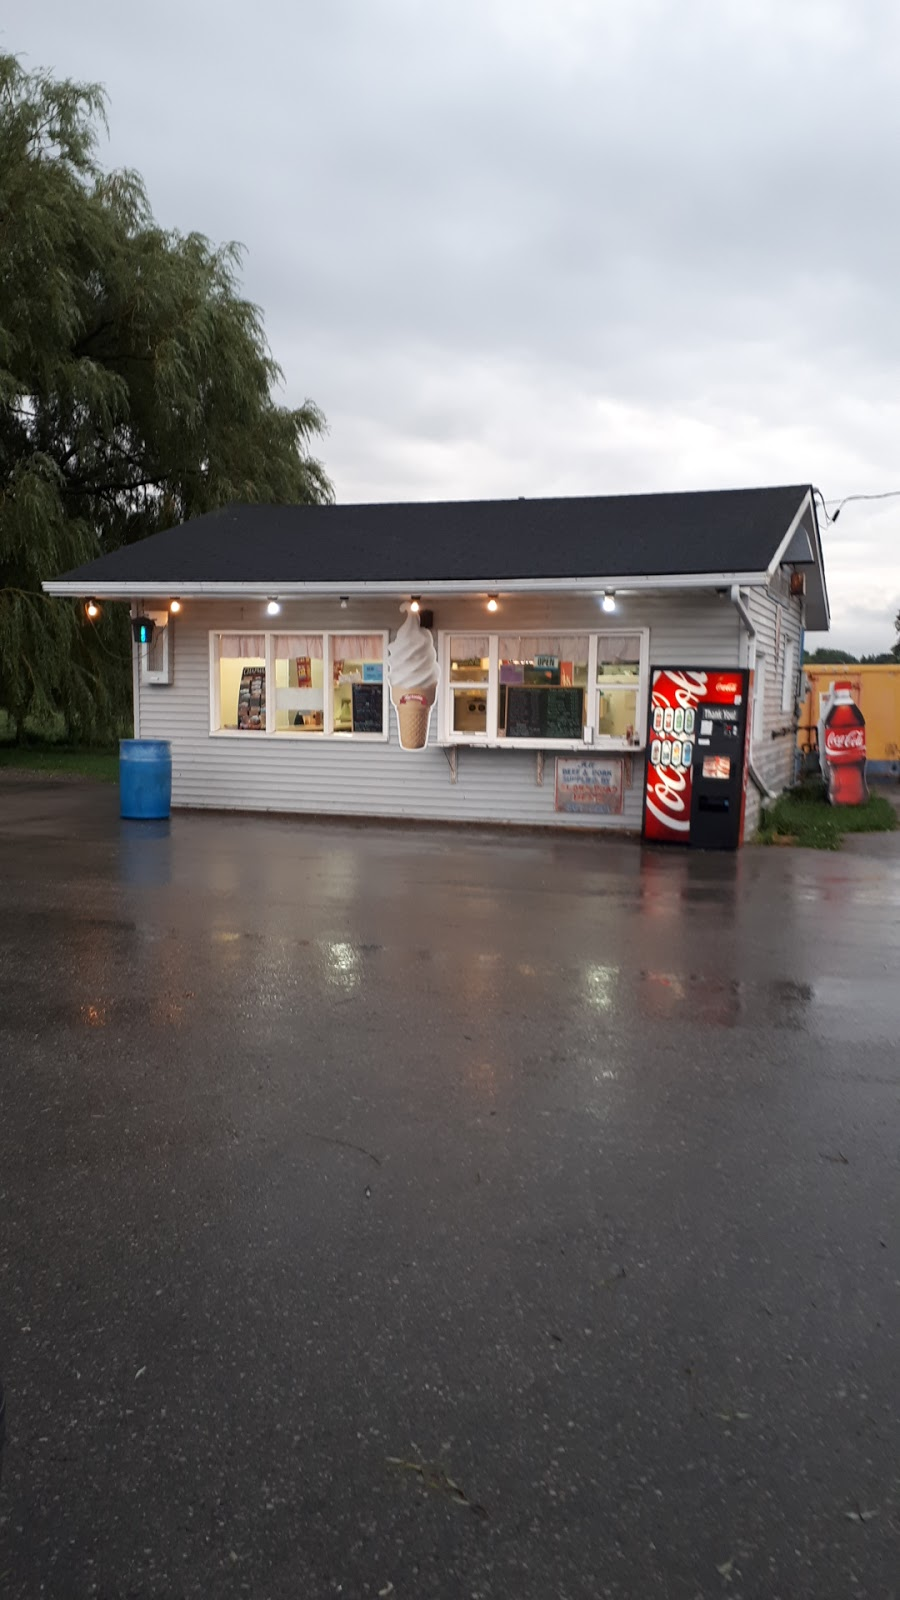 Brant Drive-In | restaurant | 1597 4, Walkerton, ON N0G 2V0, Canada | 5198812733 OR +1 519-881-2733